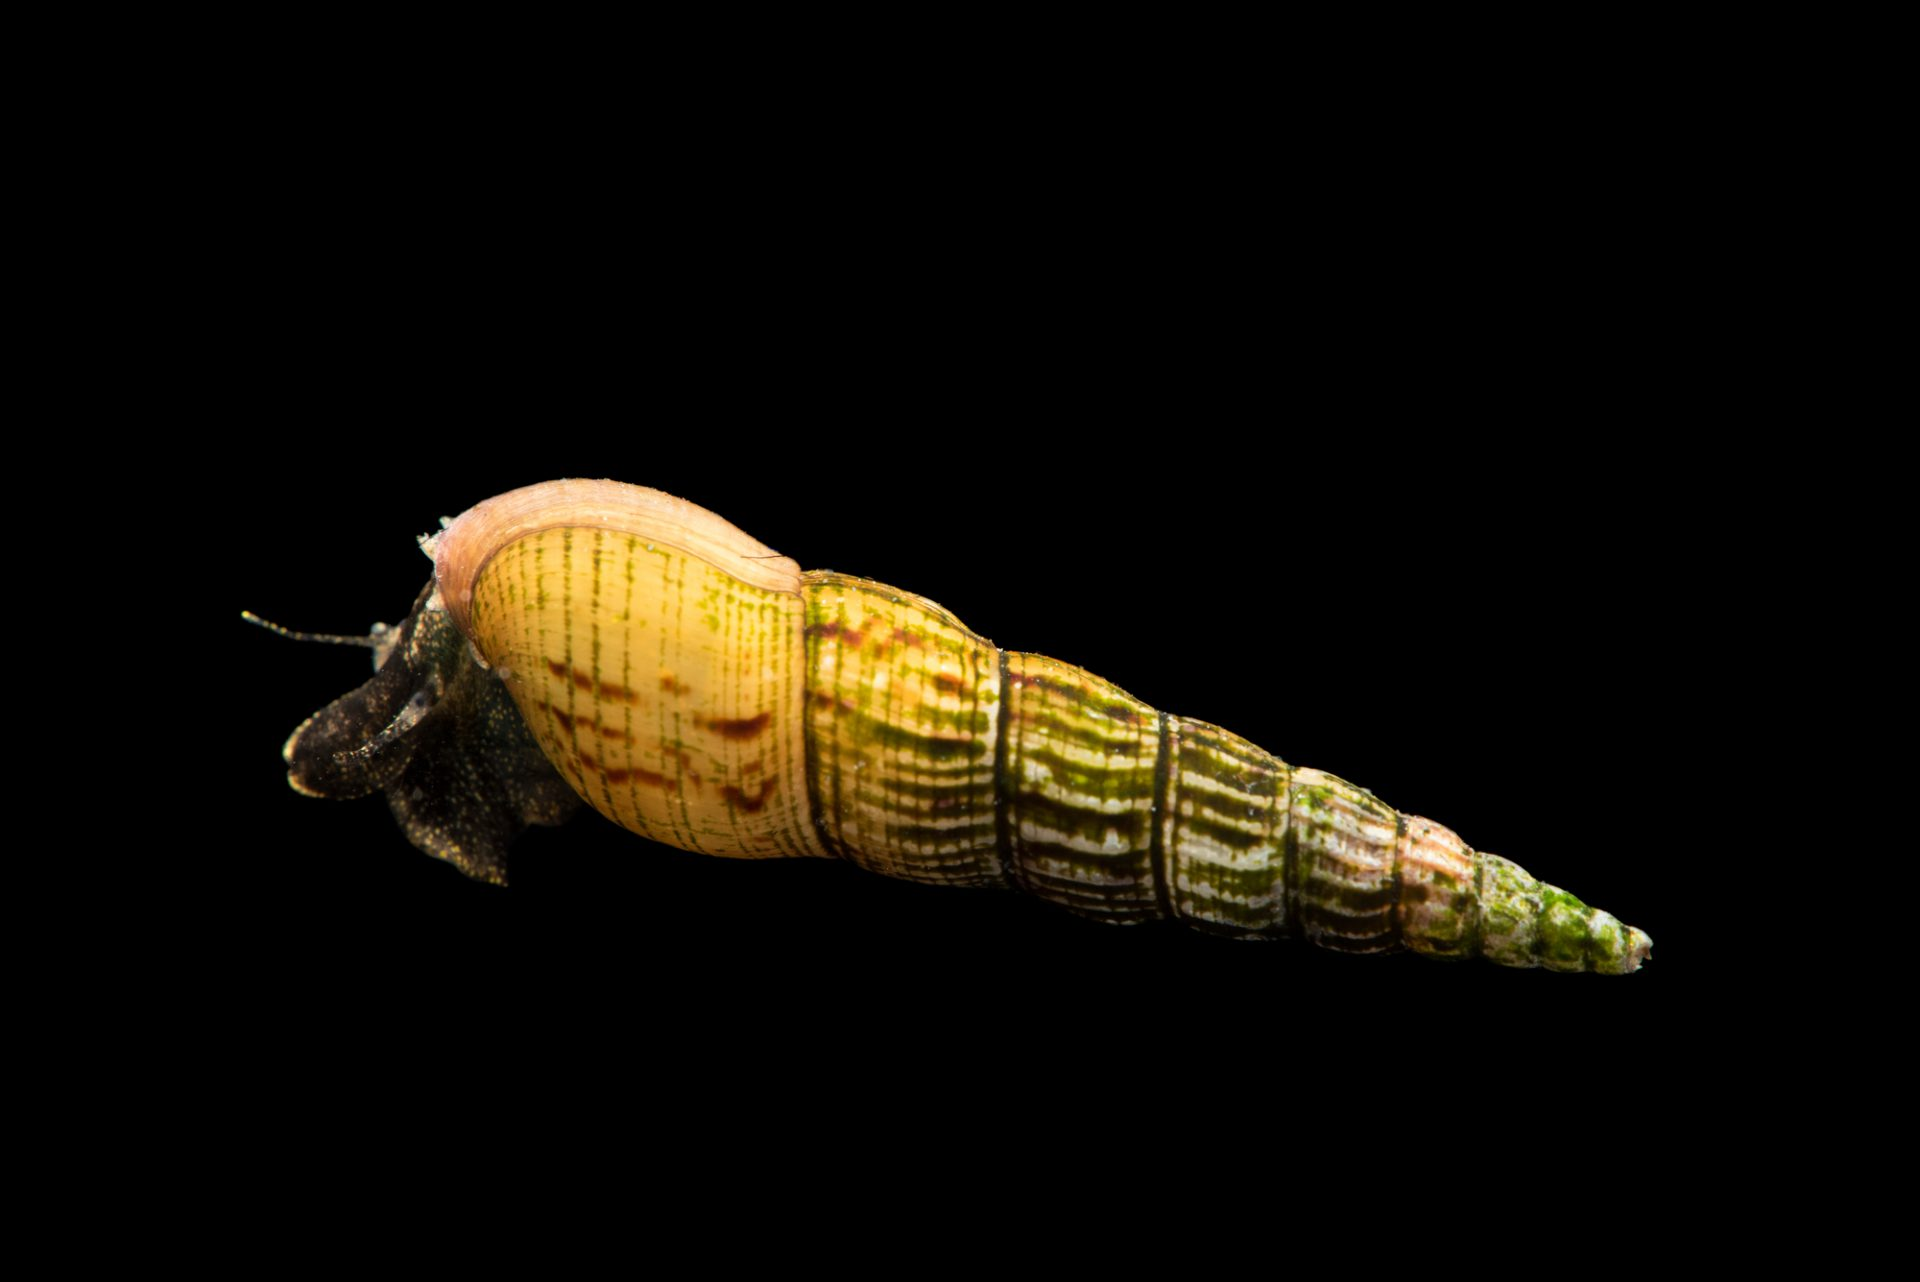 Photo: Snails at the Arizona-Sonora Desert Museum in Tucson, AZ.